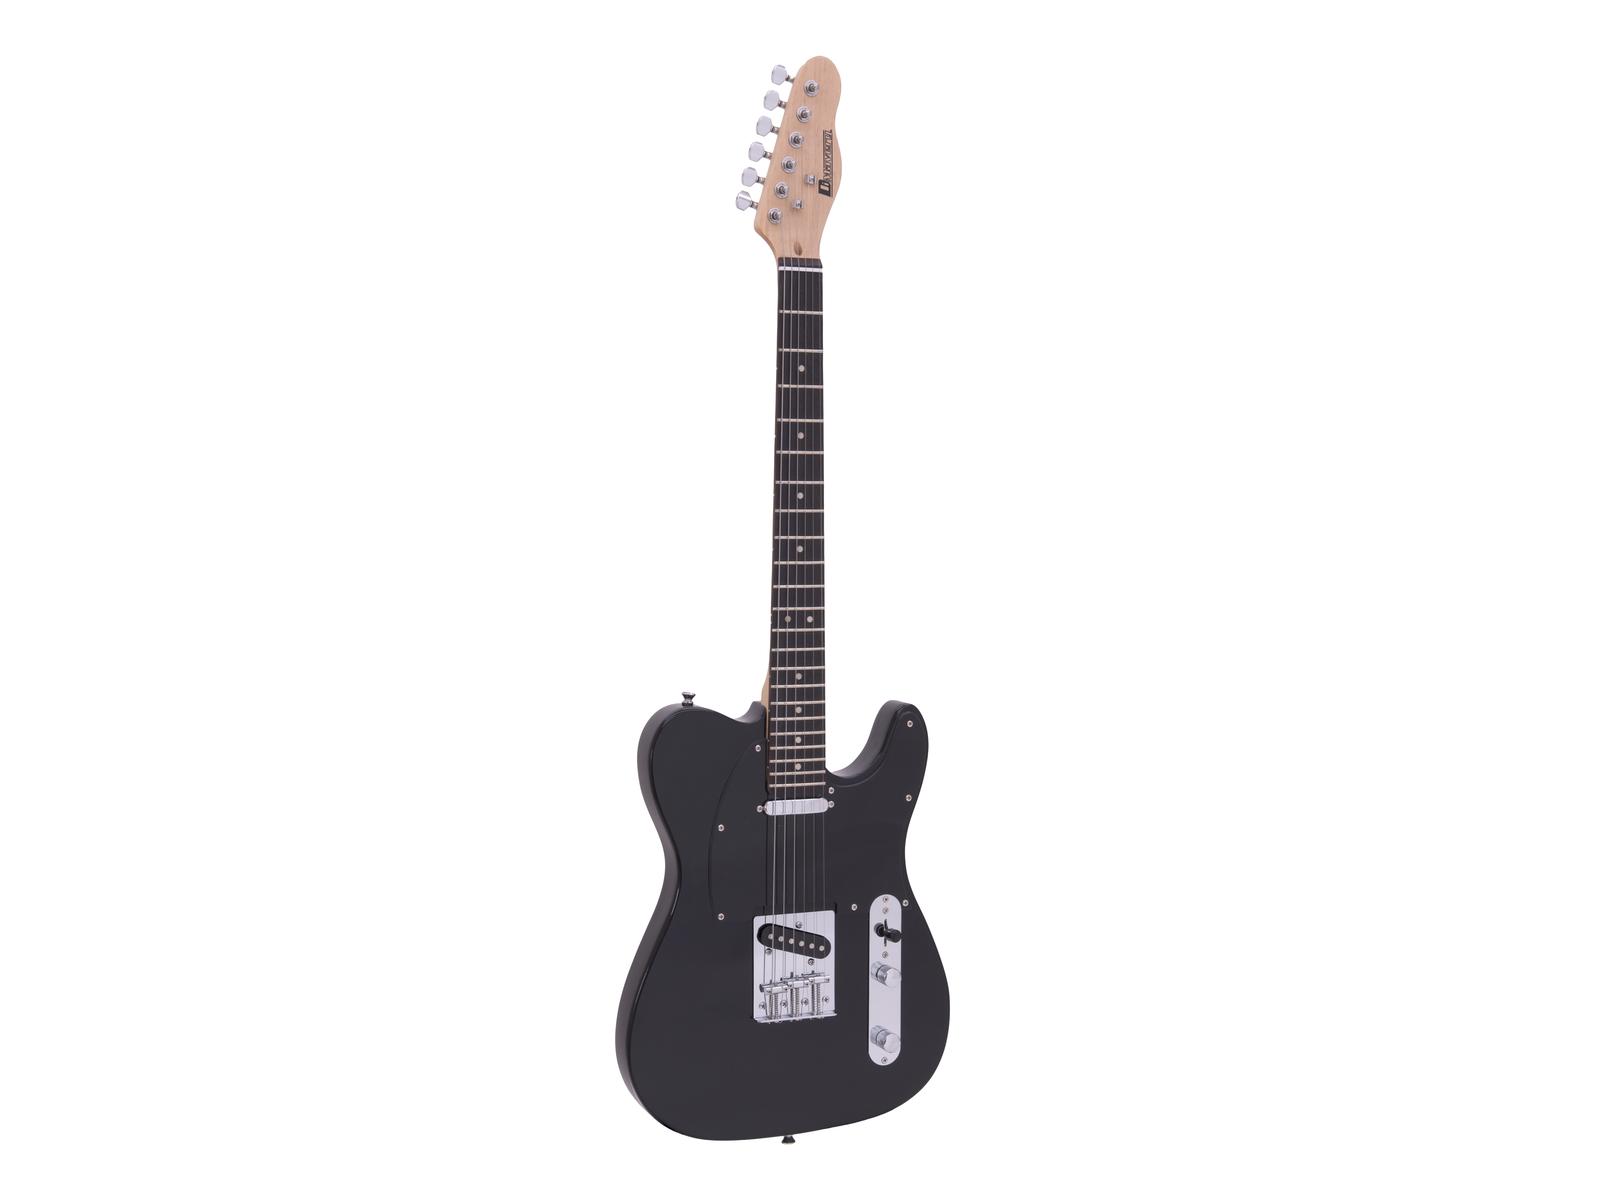 dimavery-tl-401-e-gitarre-schwarz